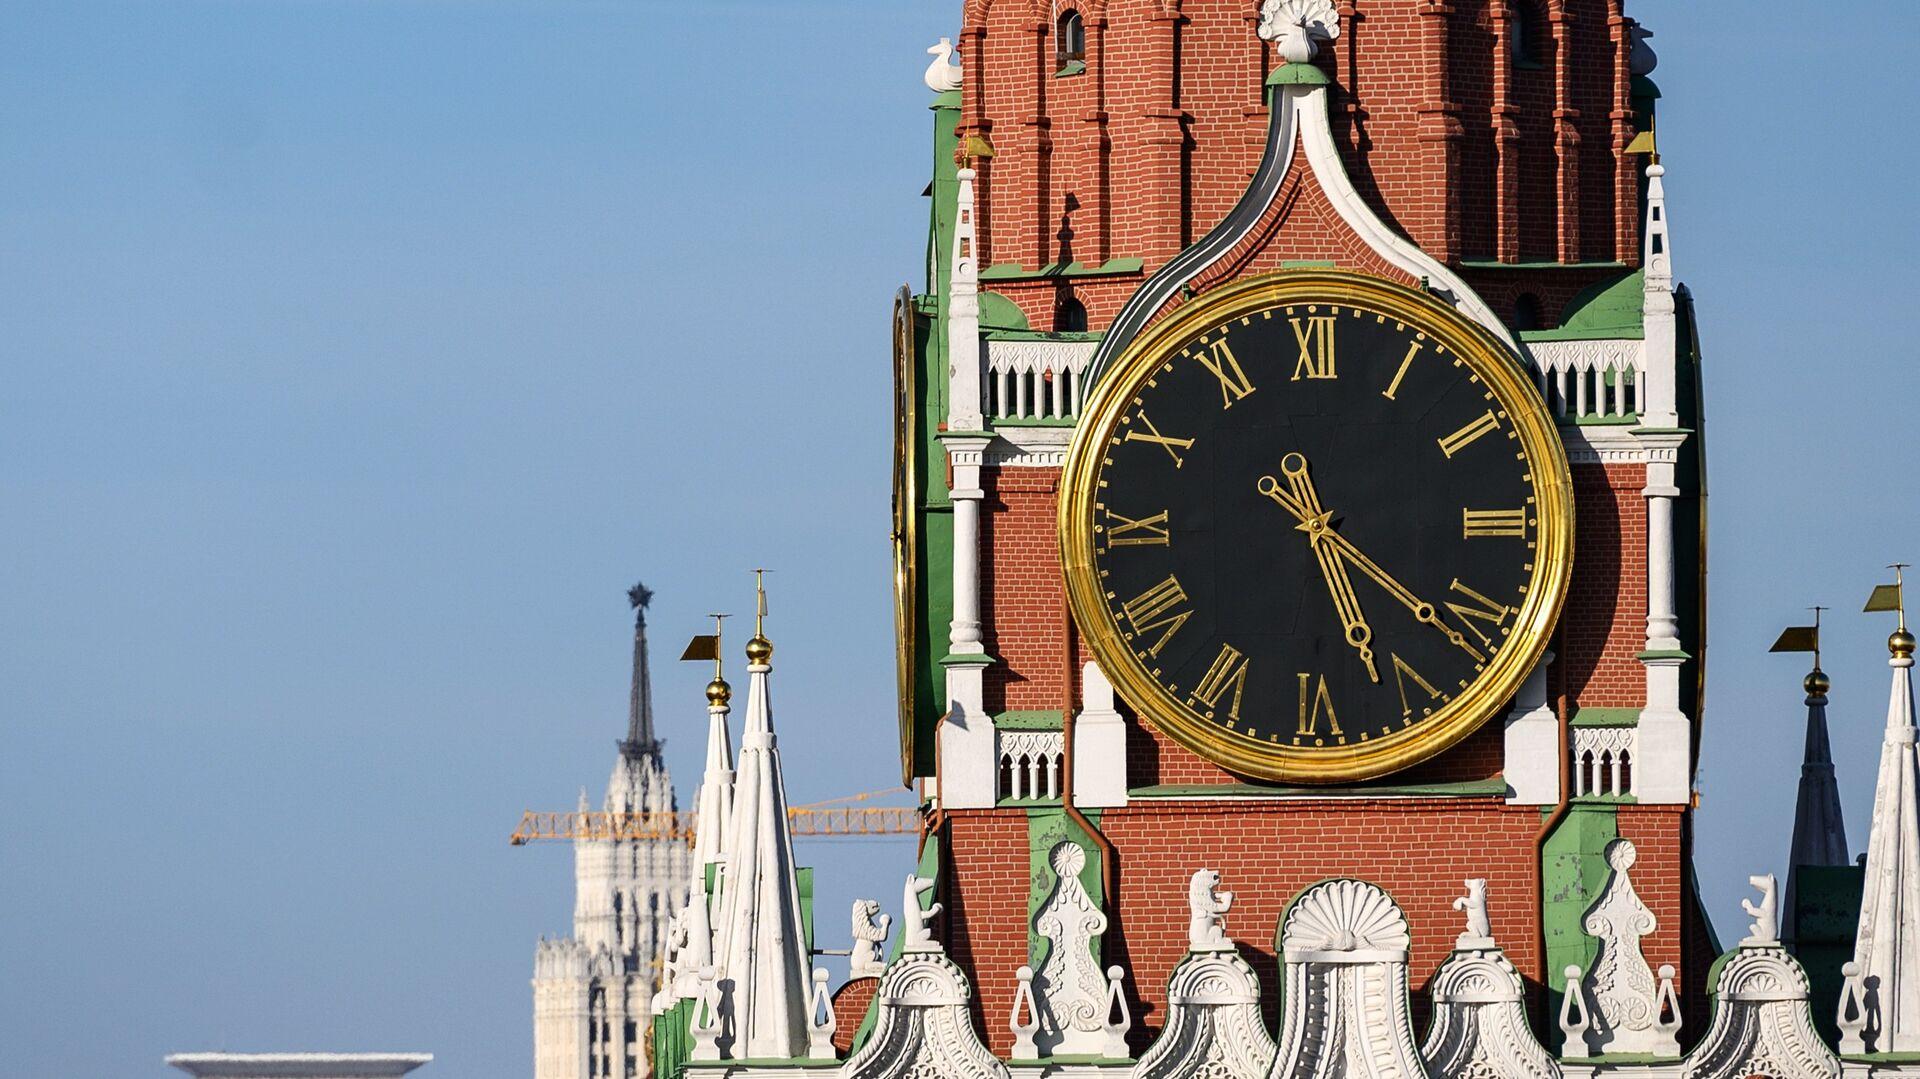 La torre Spasskaya del Kremlin de Moscú - Sputnik Mundo, 1920, 18.02.2021